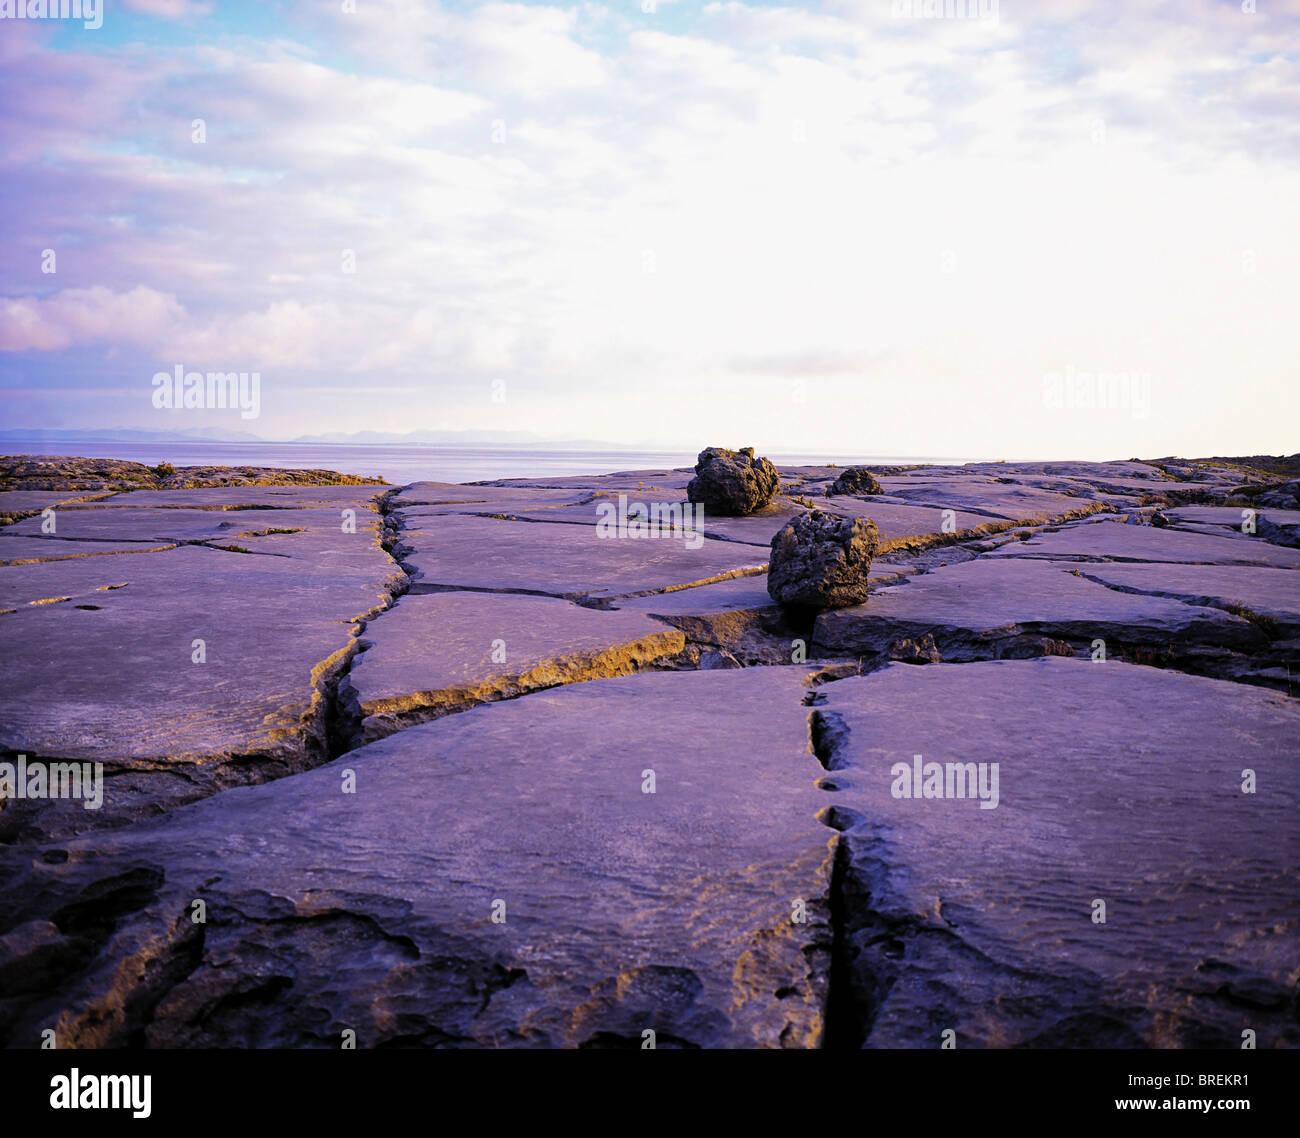 The Burren, Co Clare, Ireland, Karst-Landscape Region, Erratics - Stock Image